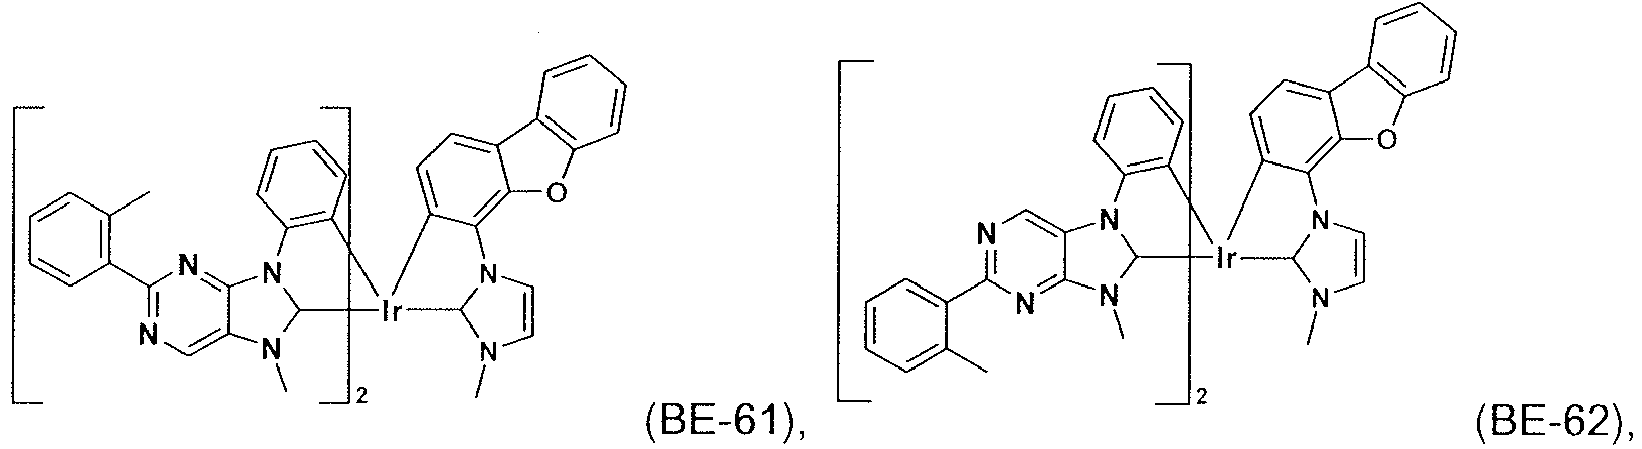 Figure imgb0618